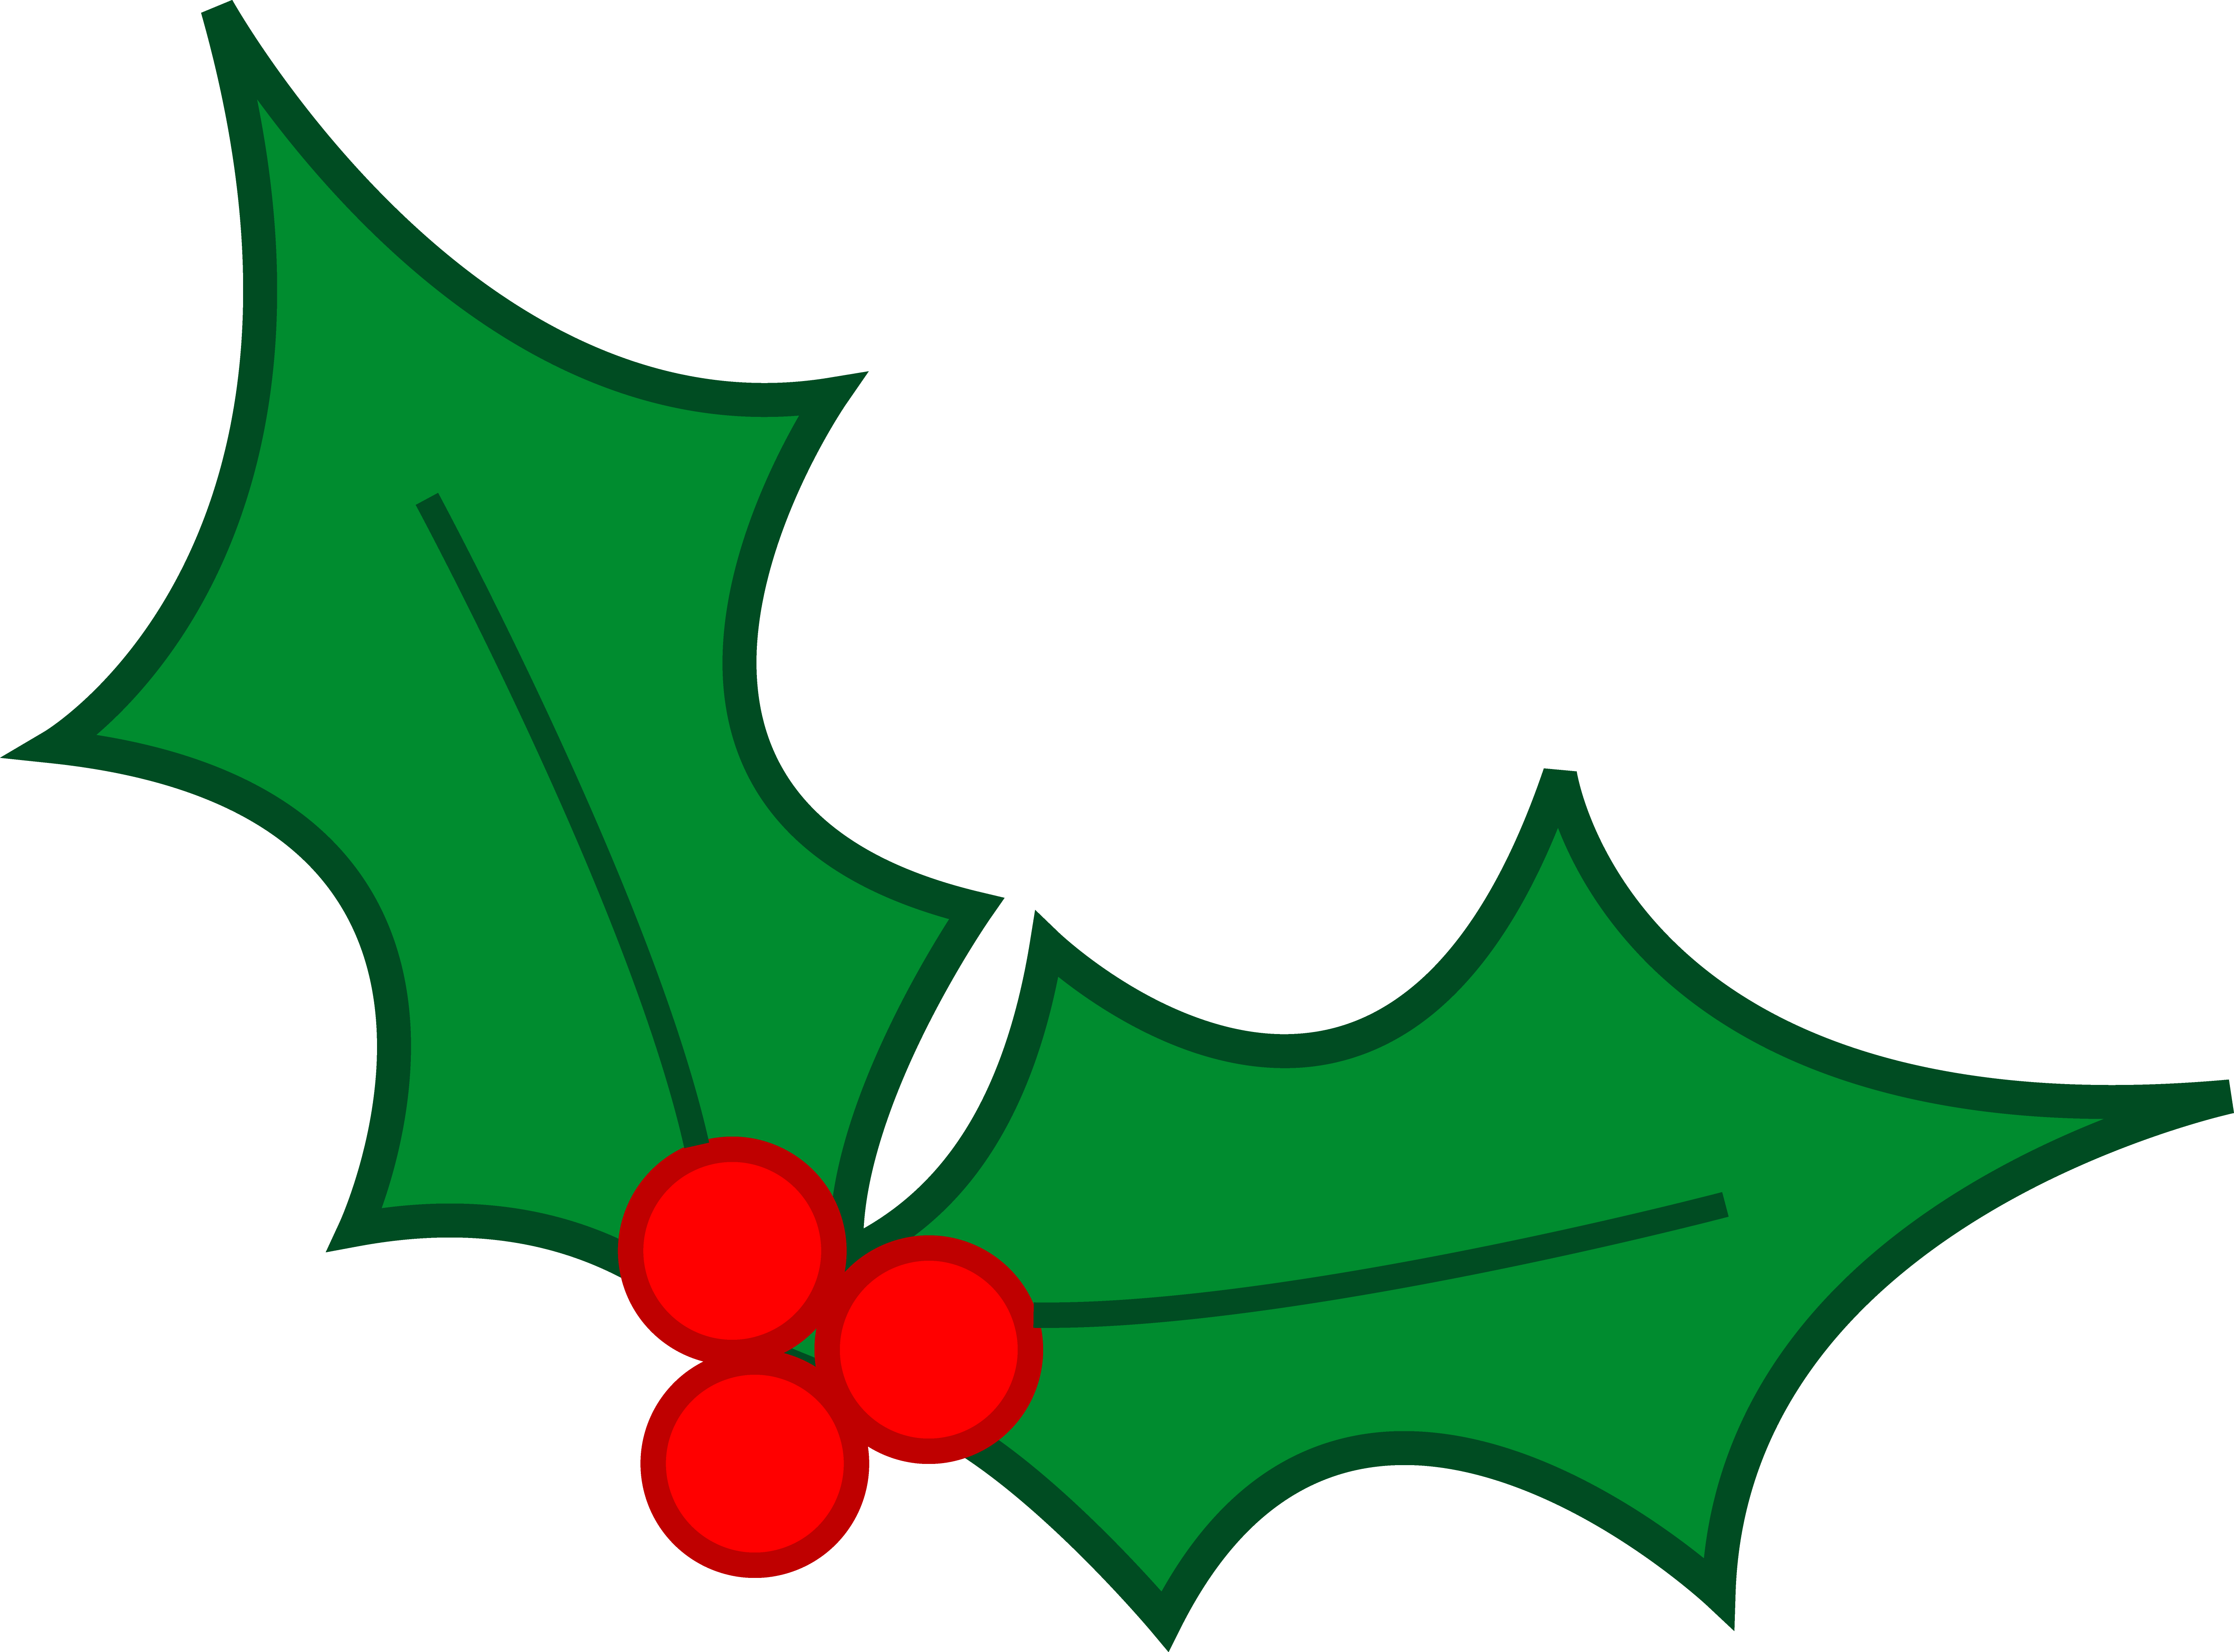 Christmas Holiday Clipart. Green Christm-Christmas holiday clipart. Green Christmas Holly Leaves .-3